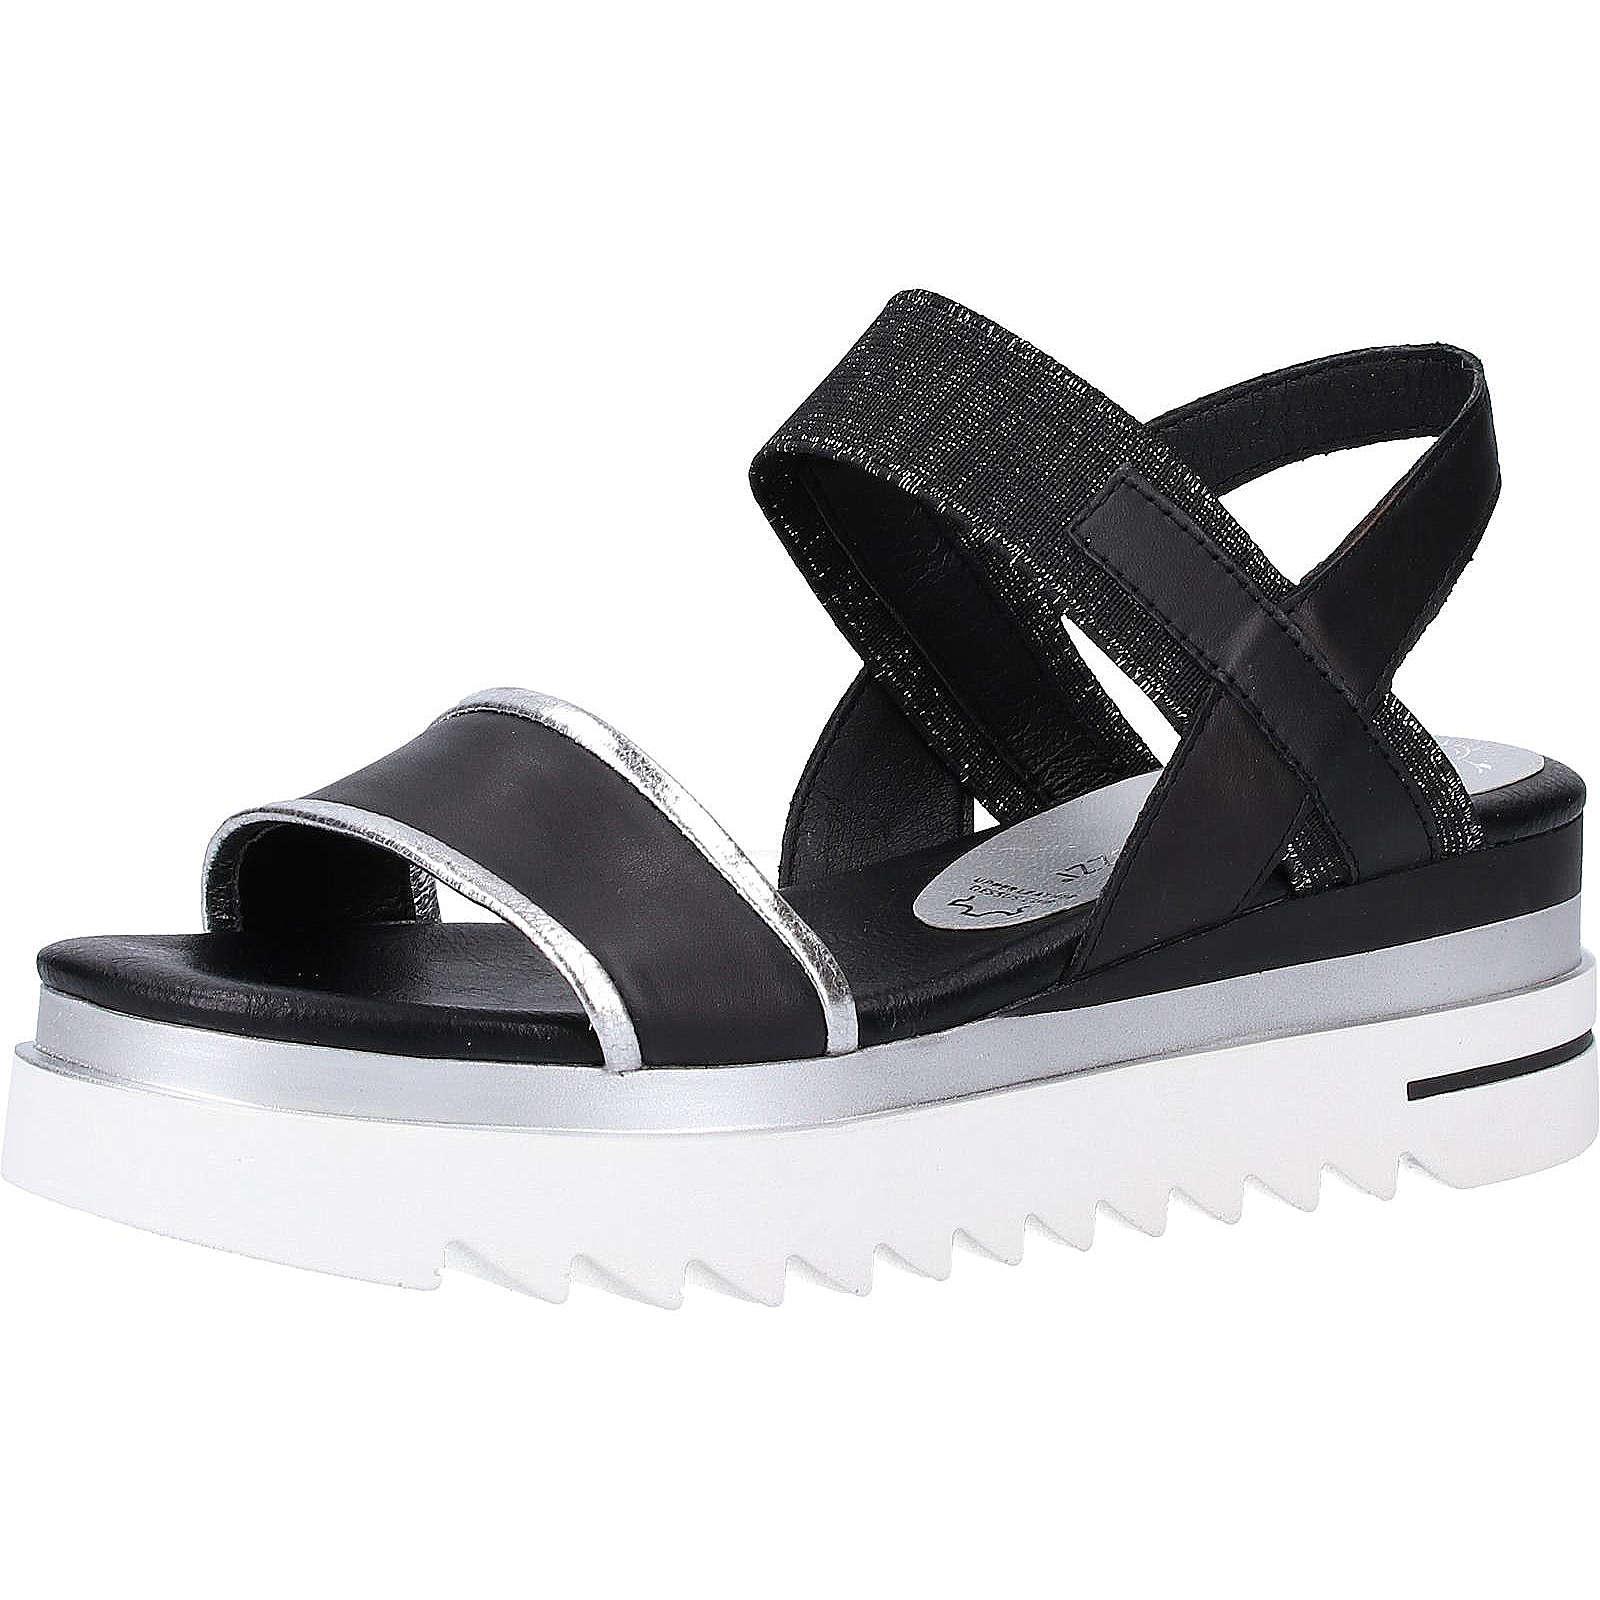 MARCO TOZZI Sandalen Klassische Sandaletten schwarz Damen Gr. 39